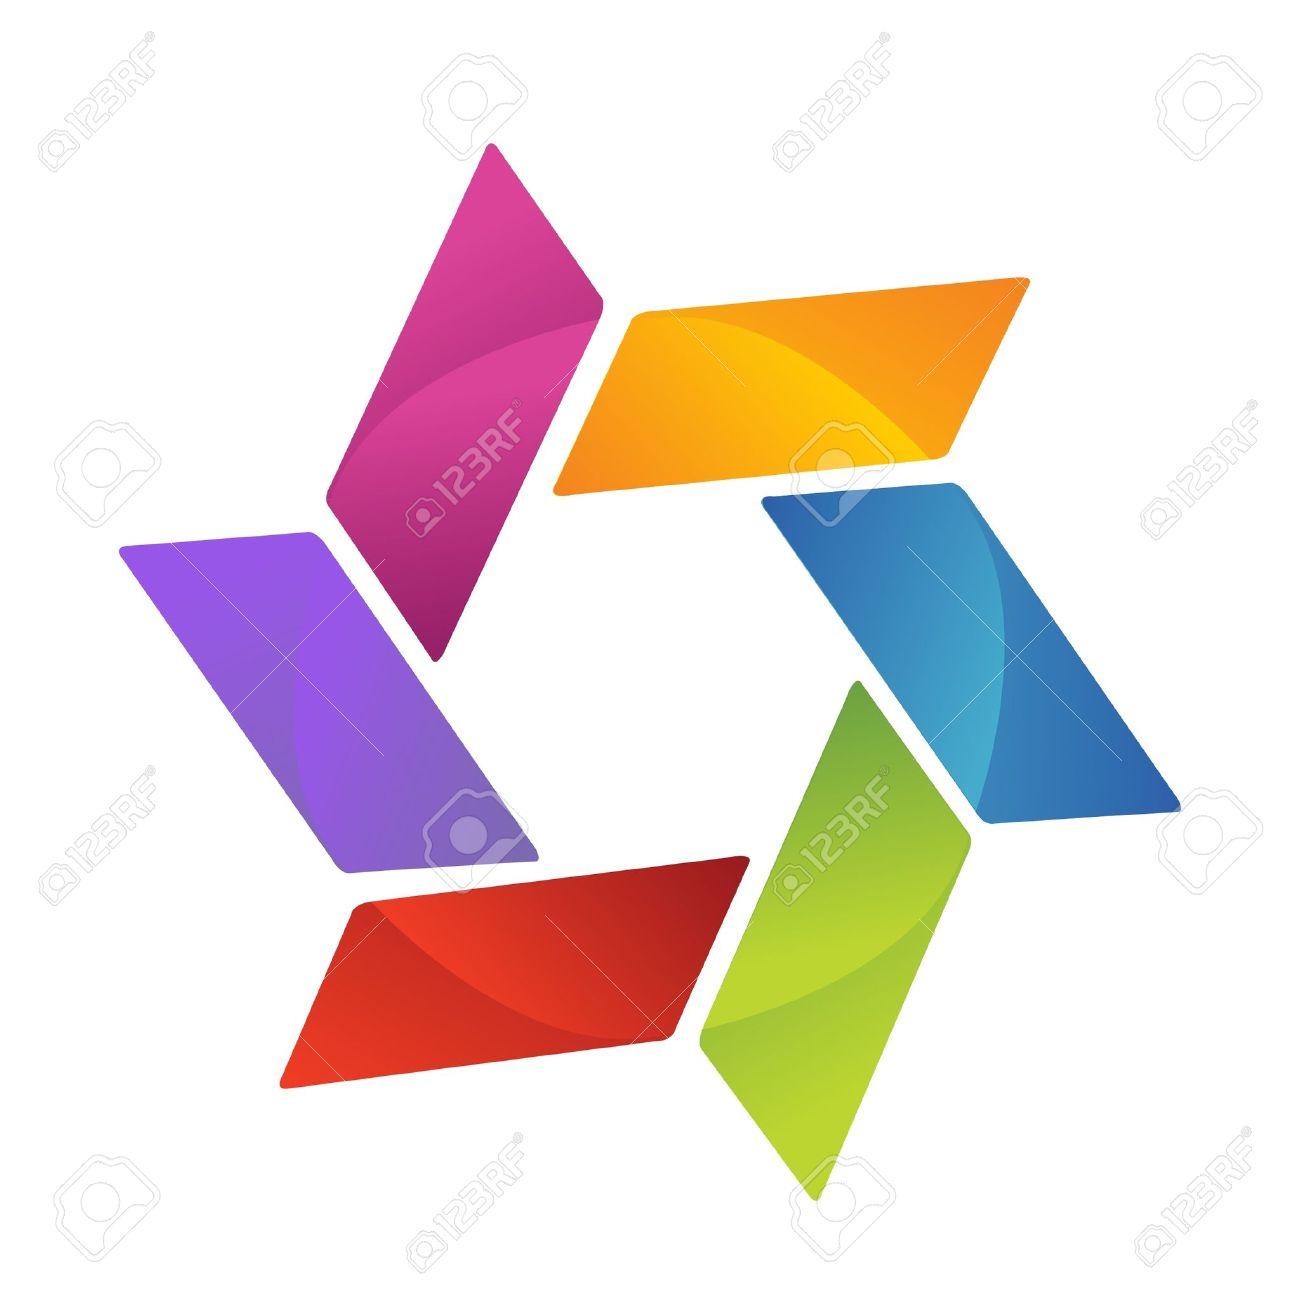 Business symbol creative design logo Stock Vector - 11591184